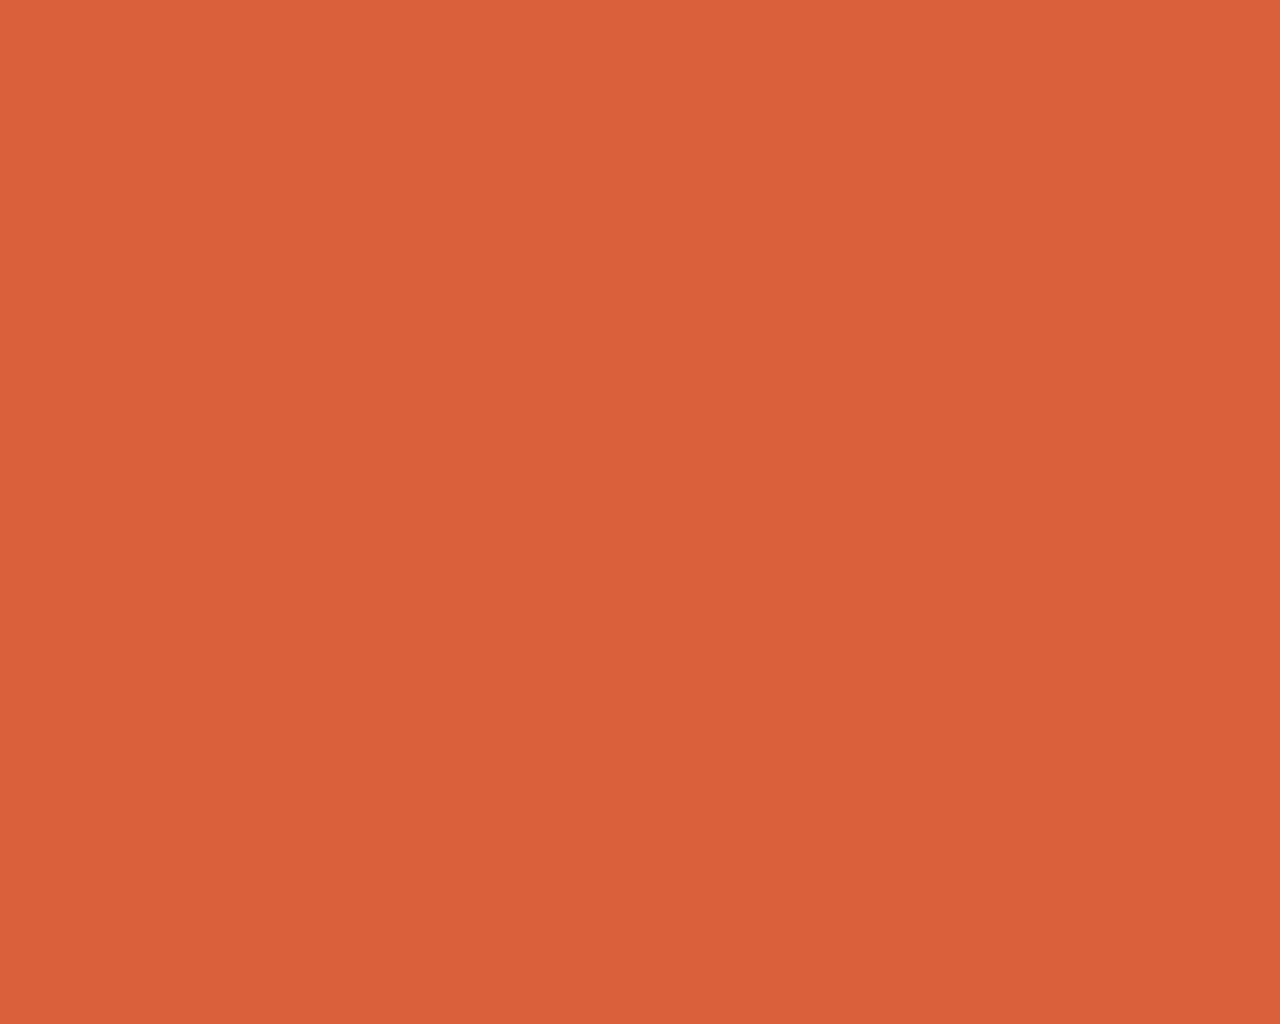 1280x1024 Medium Vermilion Solid Color Background